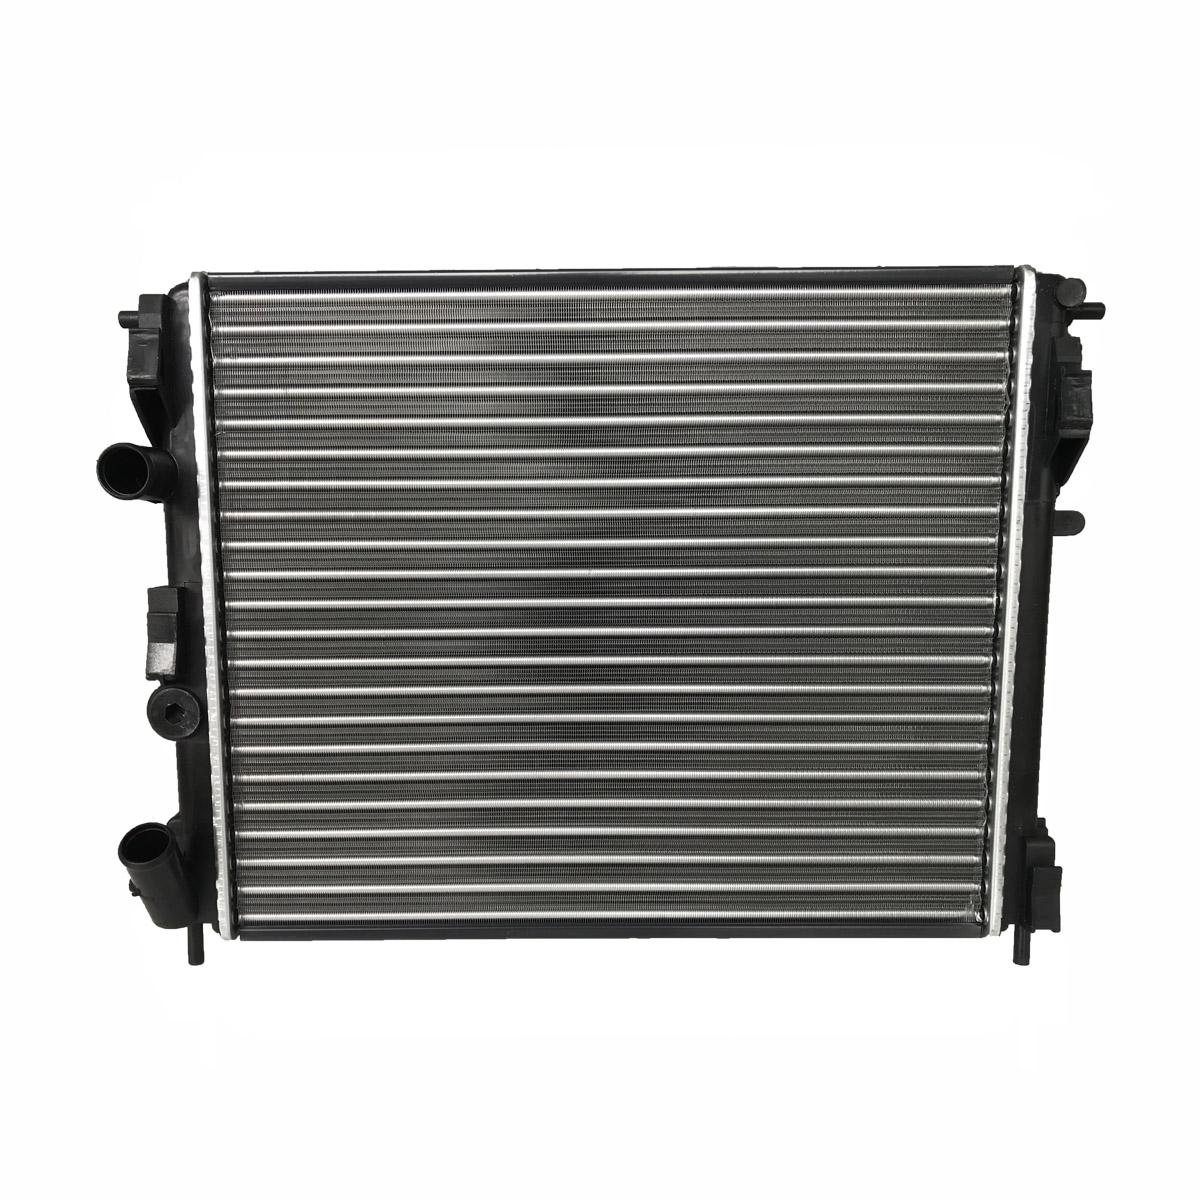 Radiador de Água Renault Clio 1.0 1.6 99> C/S Ar / Logan/ Sandero 1.0 1.6 16V 07-12 C/S Ar Mec.